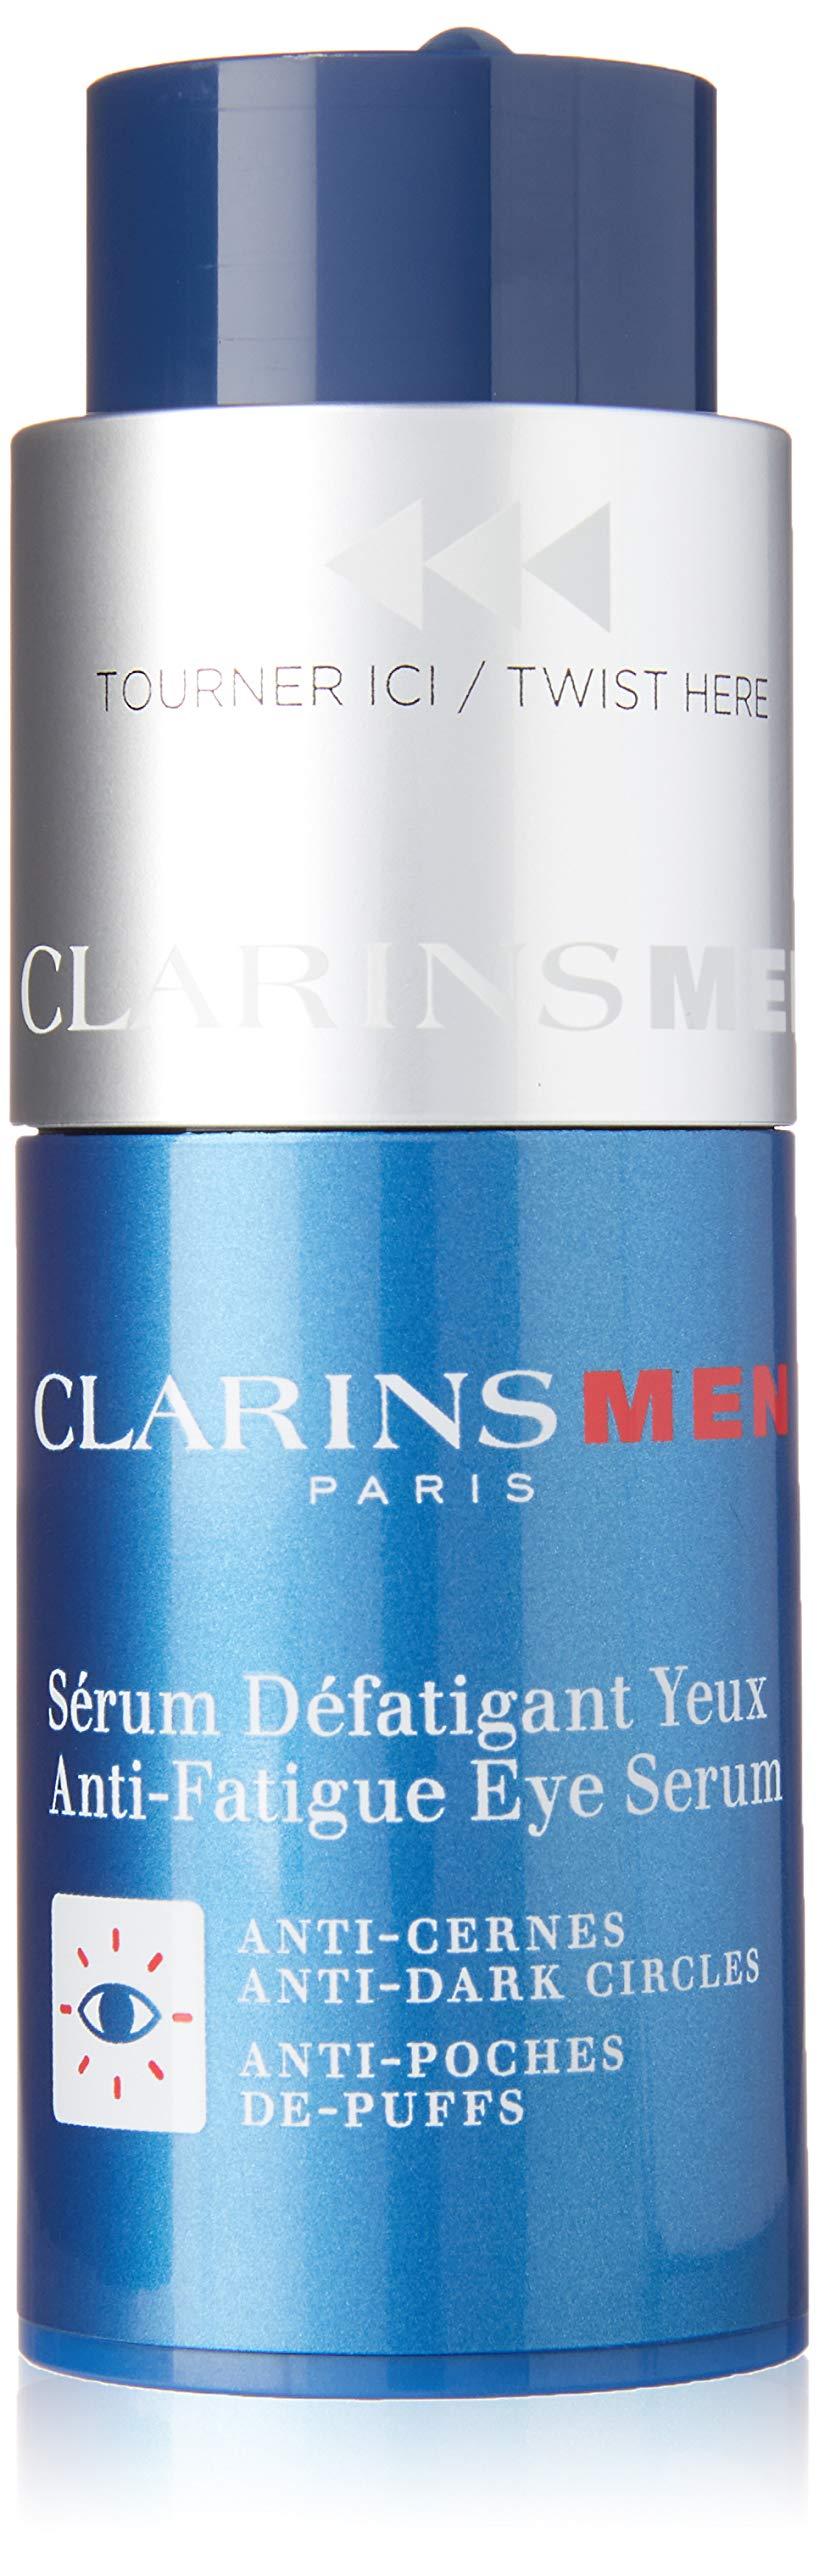 Clarins Men – Serum defatigante ojos – 20 ml